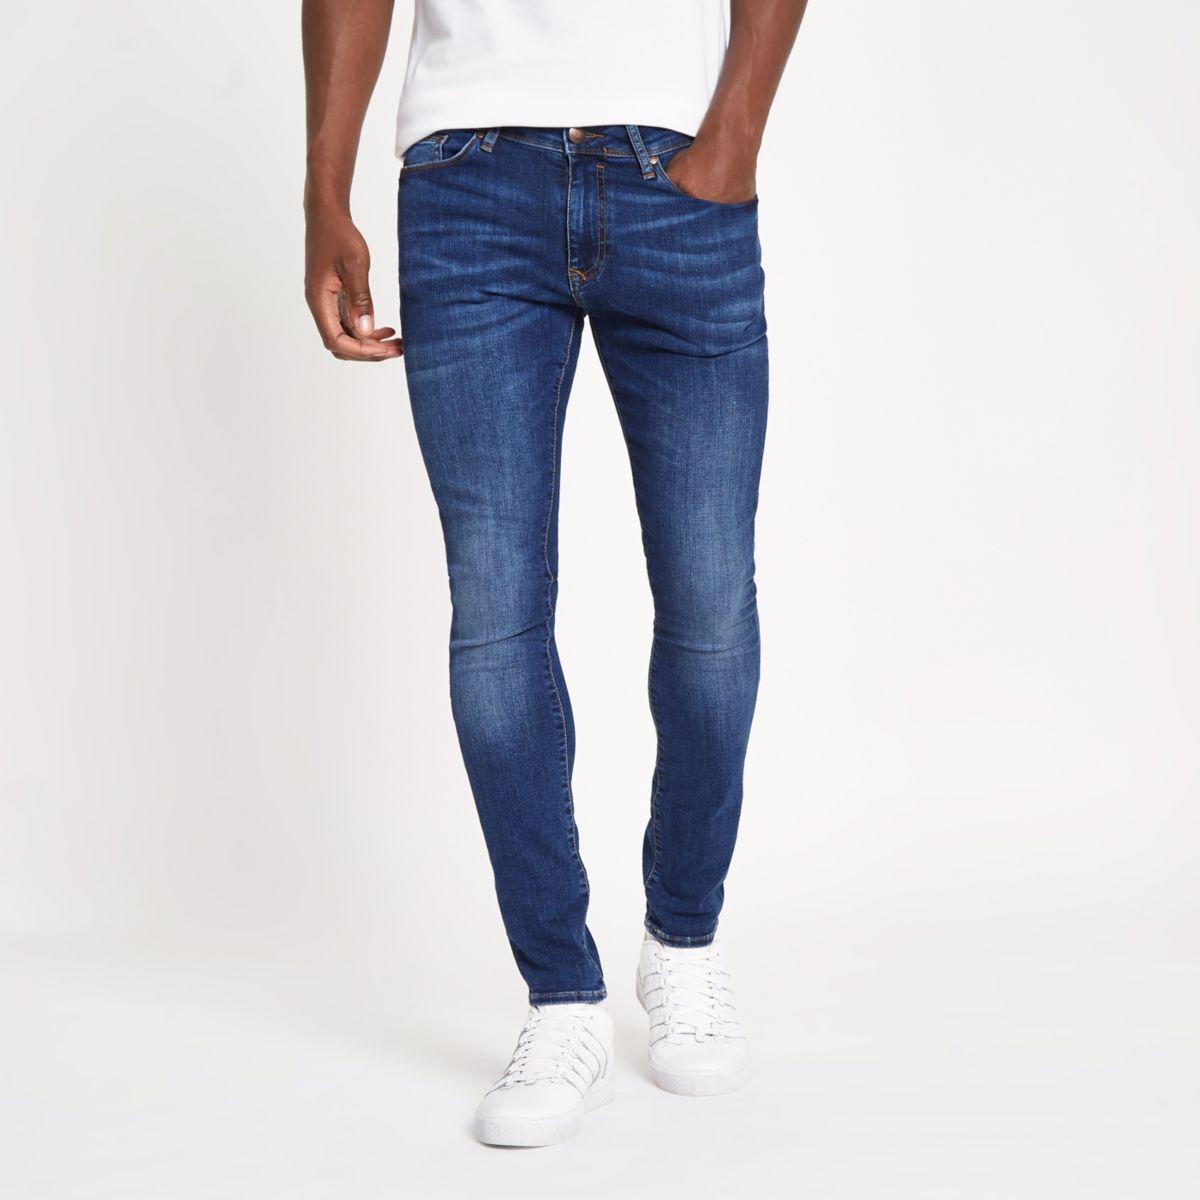 Mid blue plain super skinny jeans